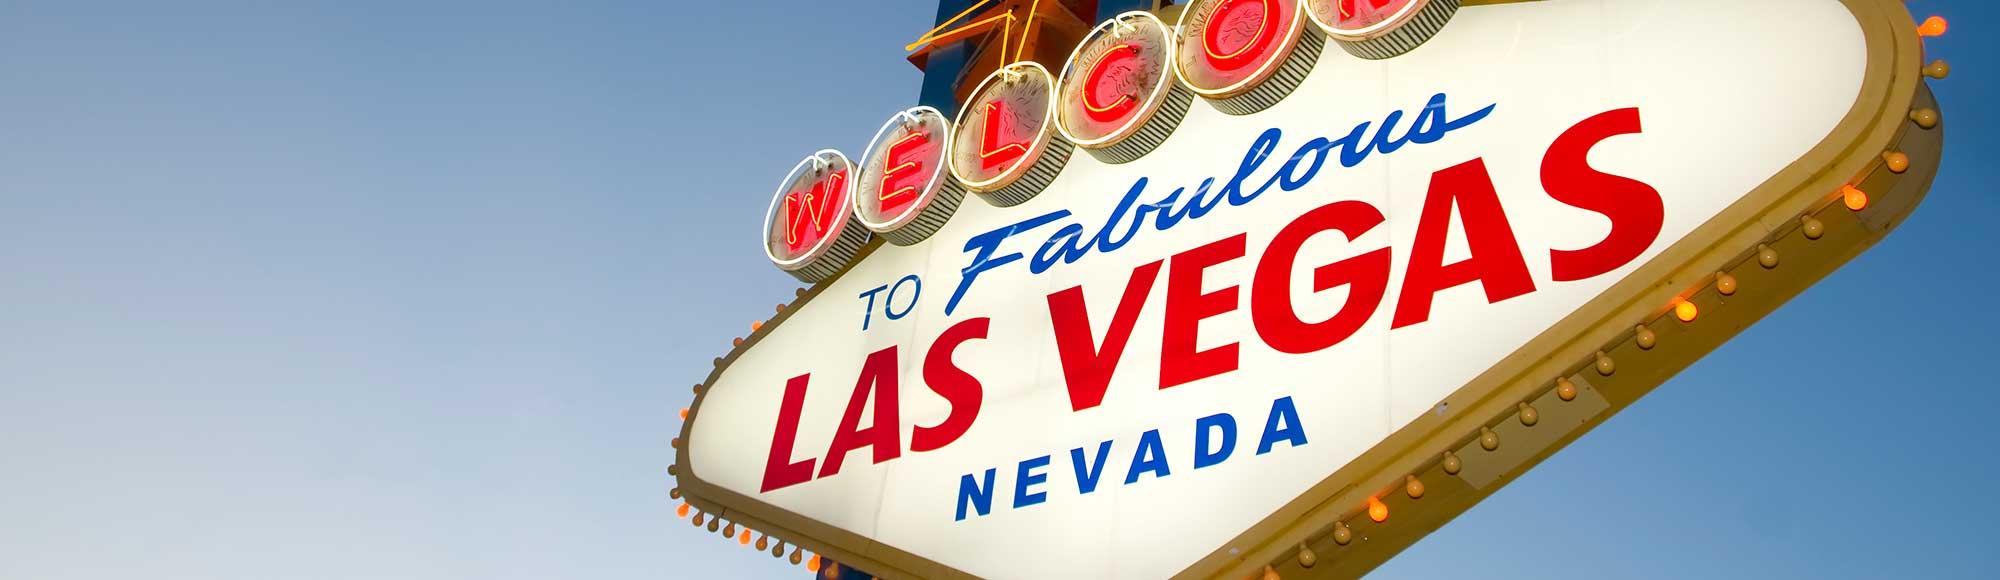 Las vegas usa casino kasinopelit arvostelu